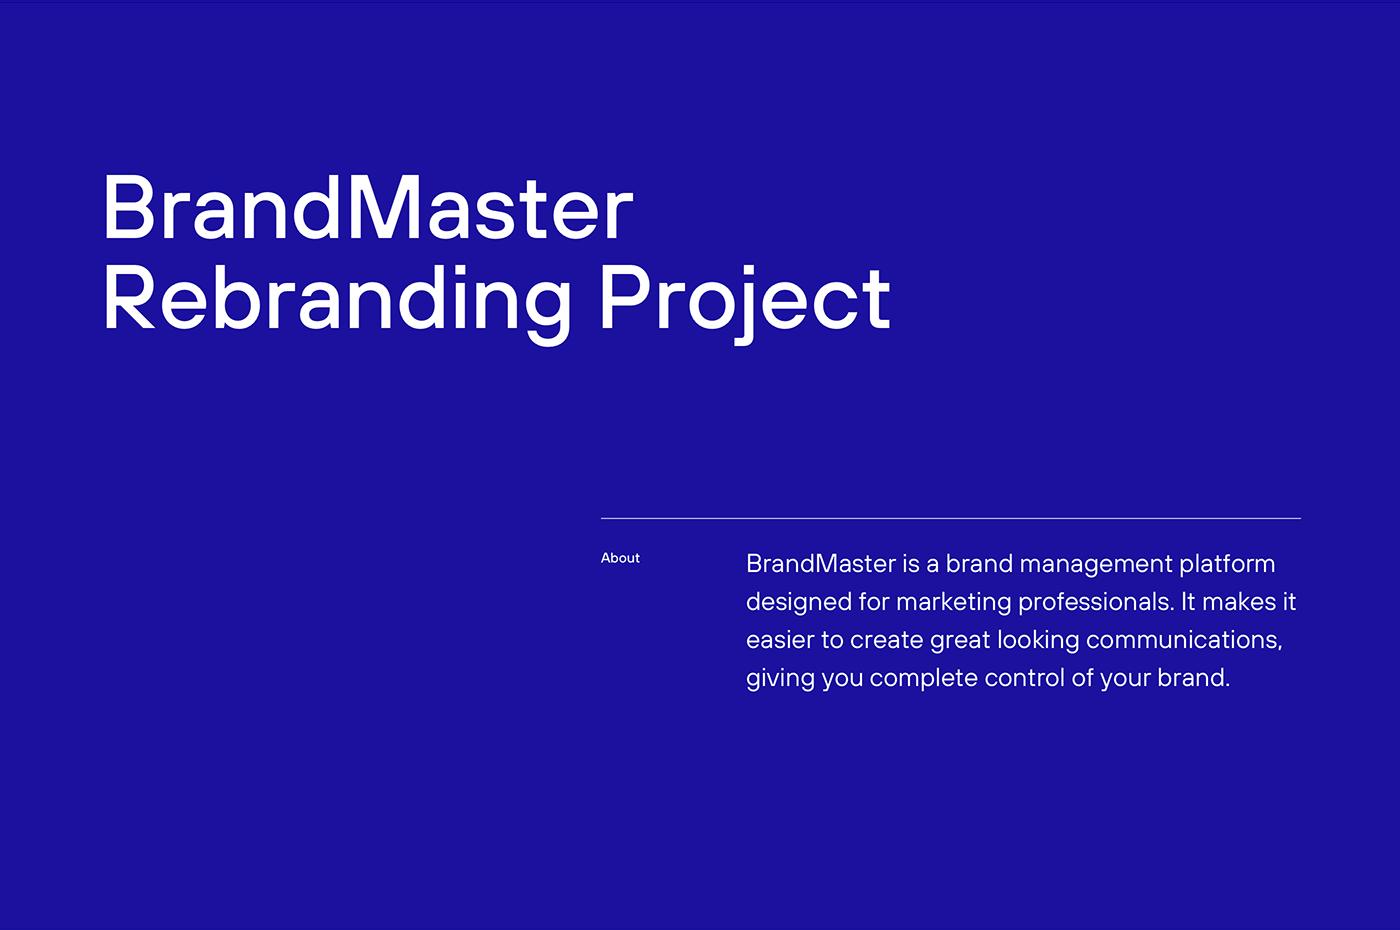 3D Brand Design brand identity branding  corporate brand corporate branding Corporate Identity visual identity poster stationary